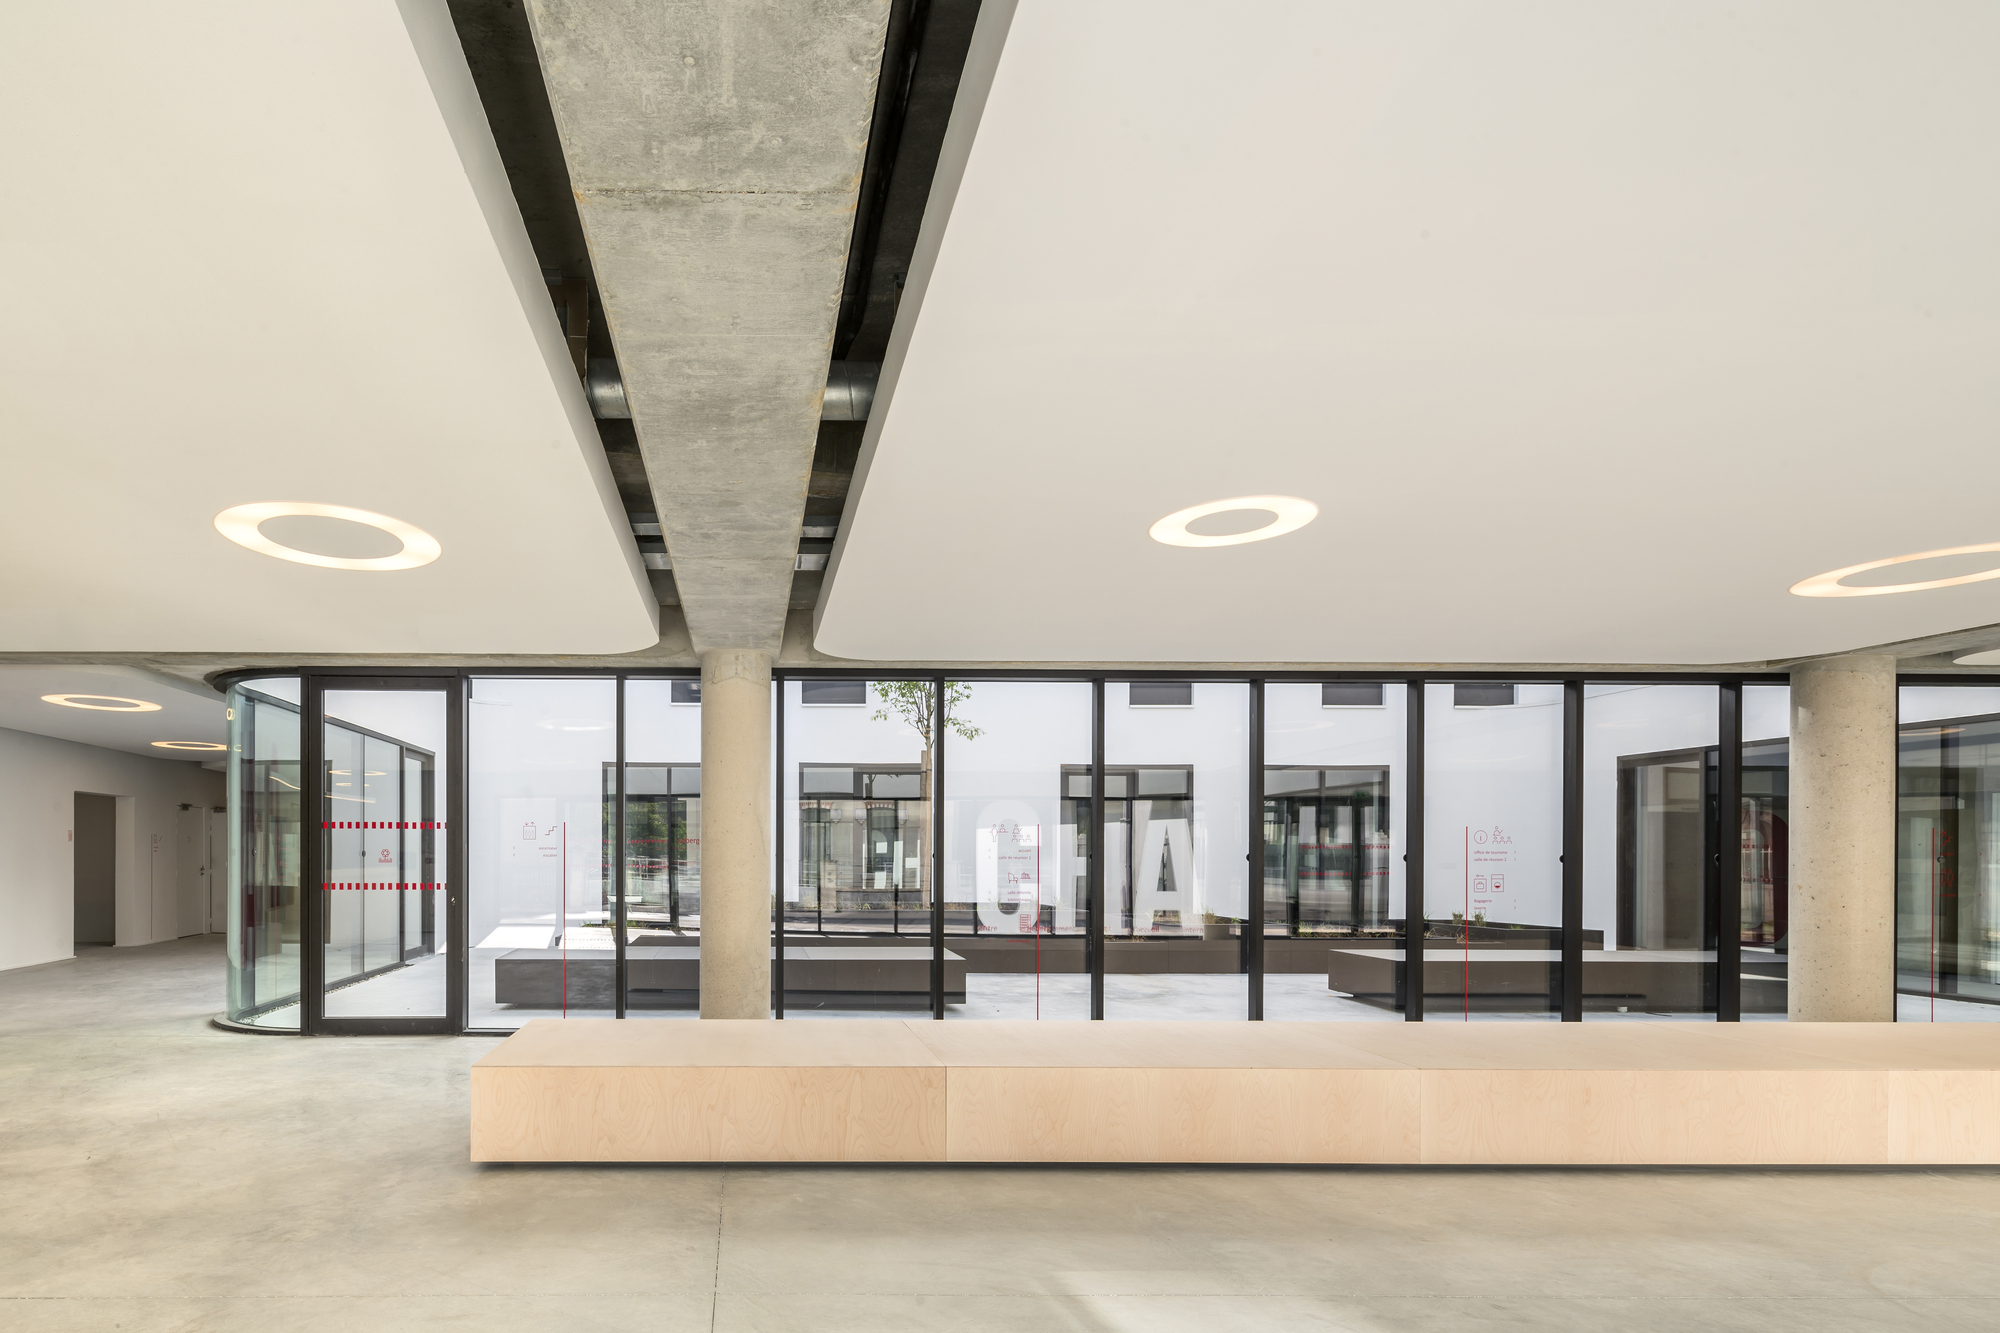 gallery of chai youth hostel antonio virga architecte 6. Black Bedroom Furniture Sets. Home Design Ideas